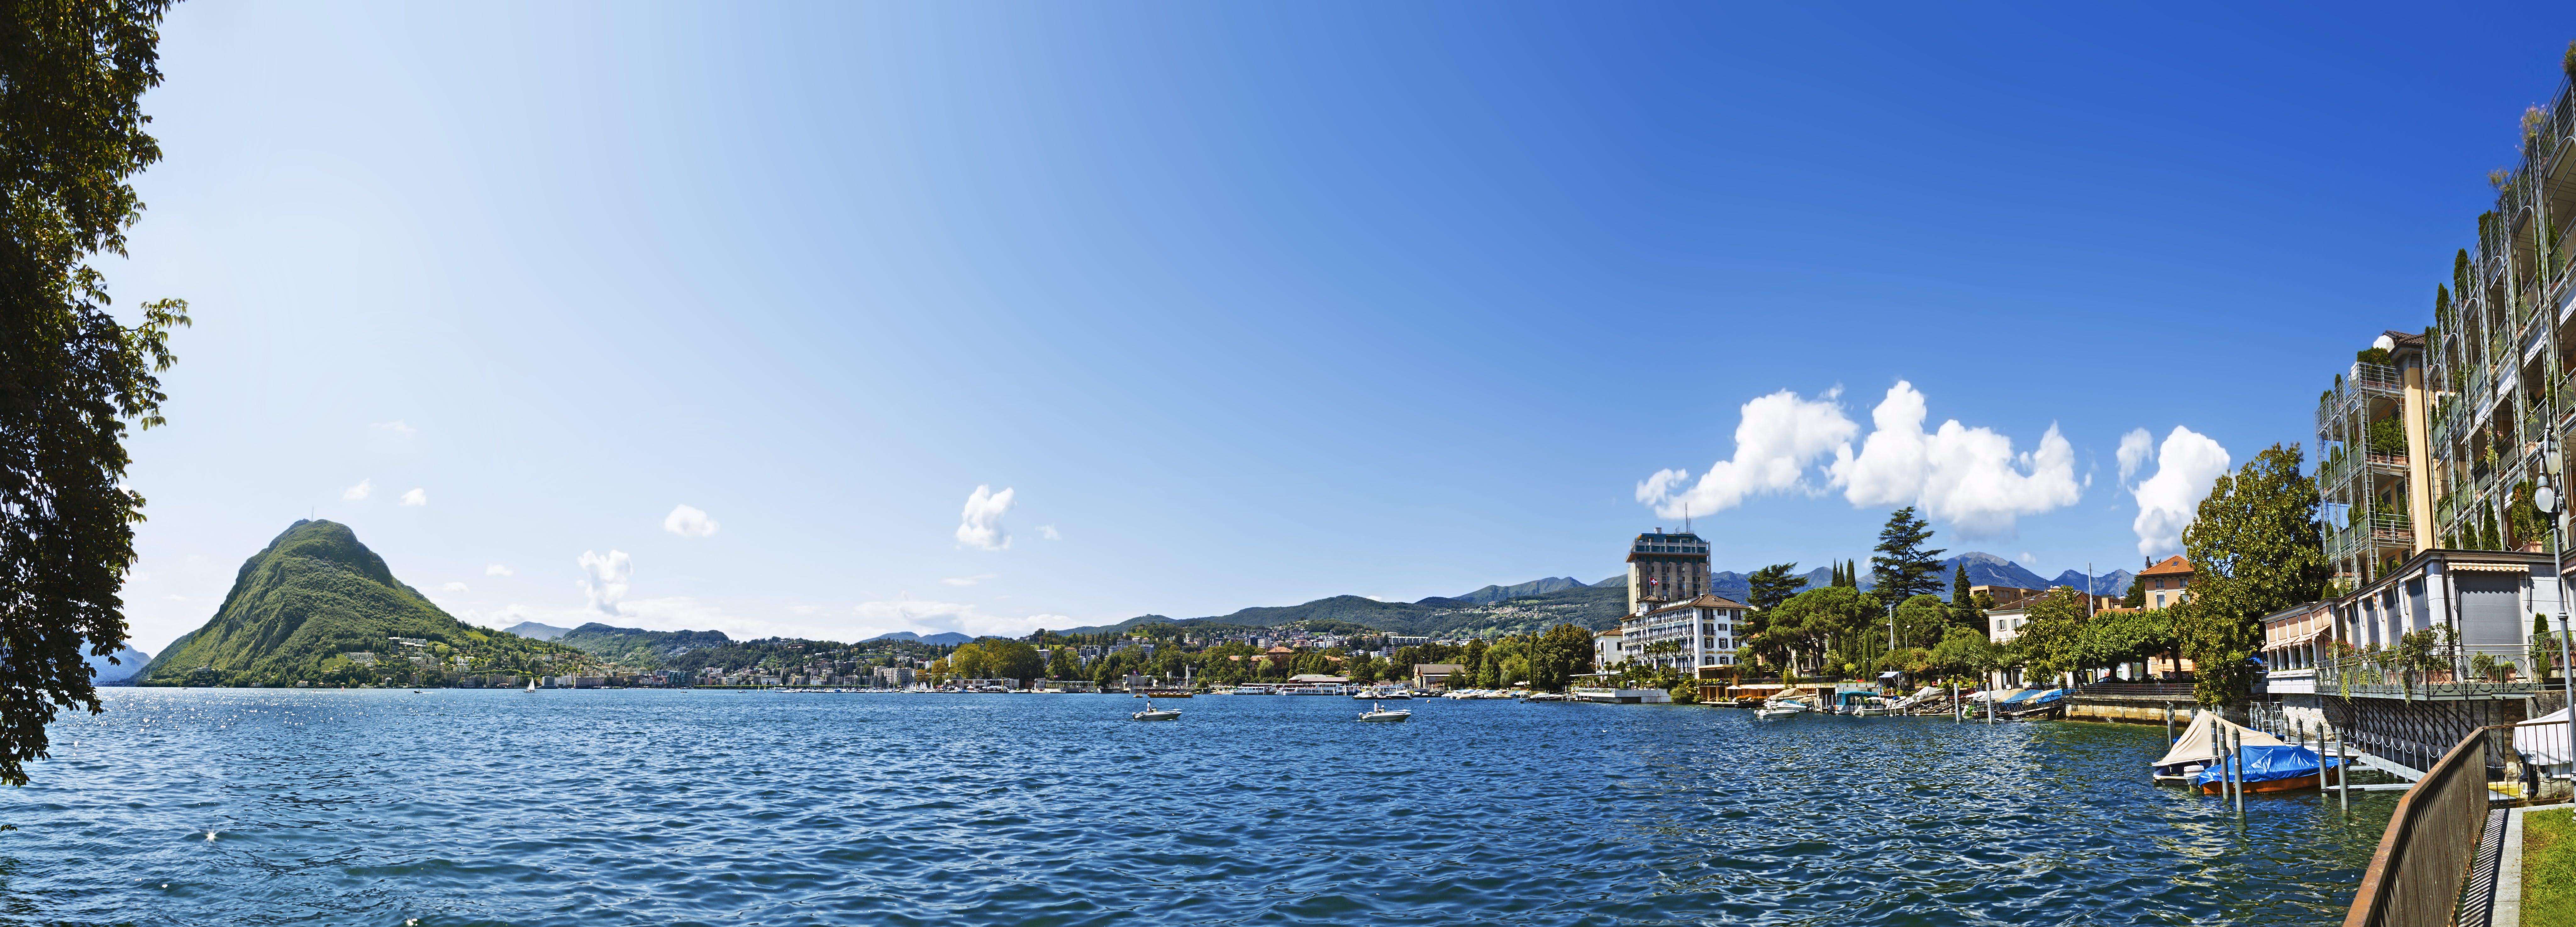 Panoramic Shot Of Lake